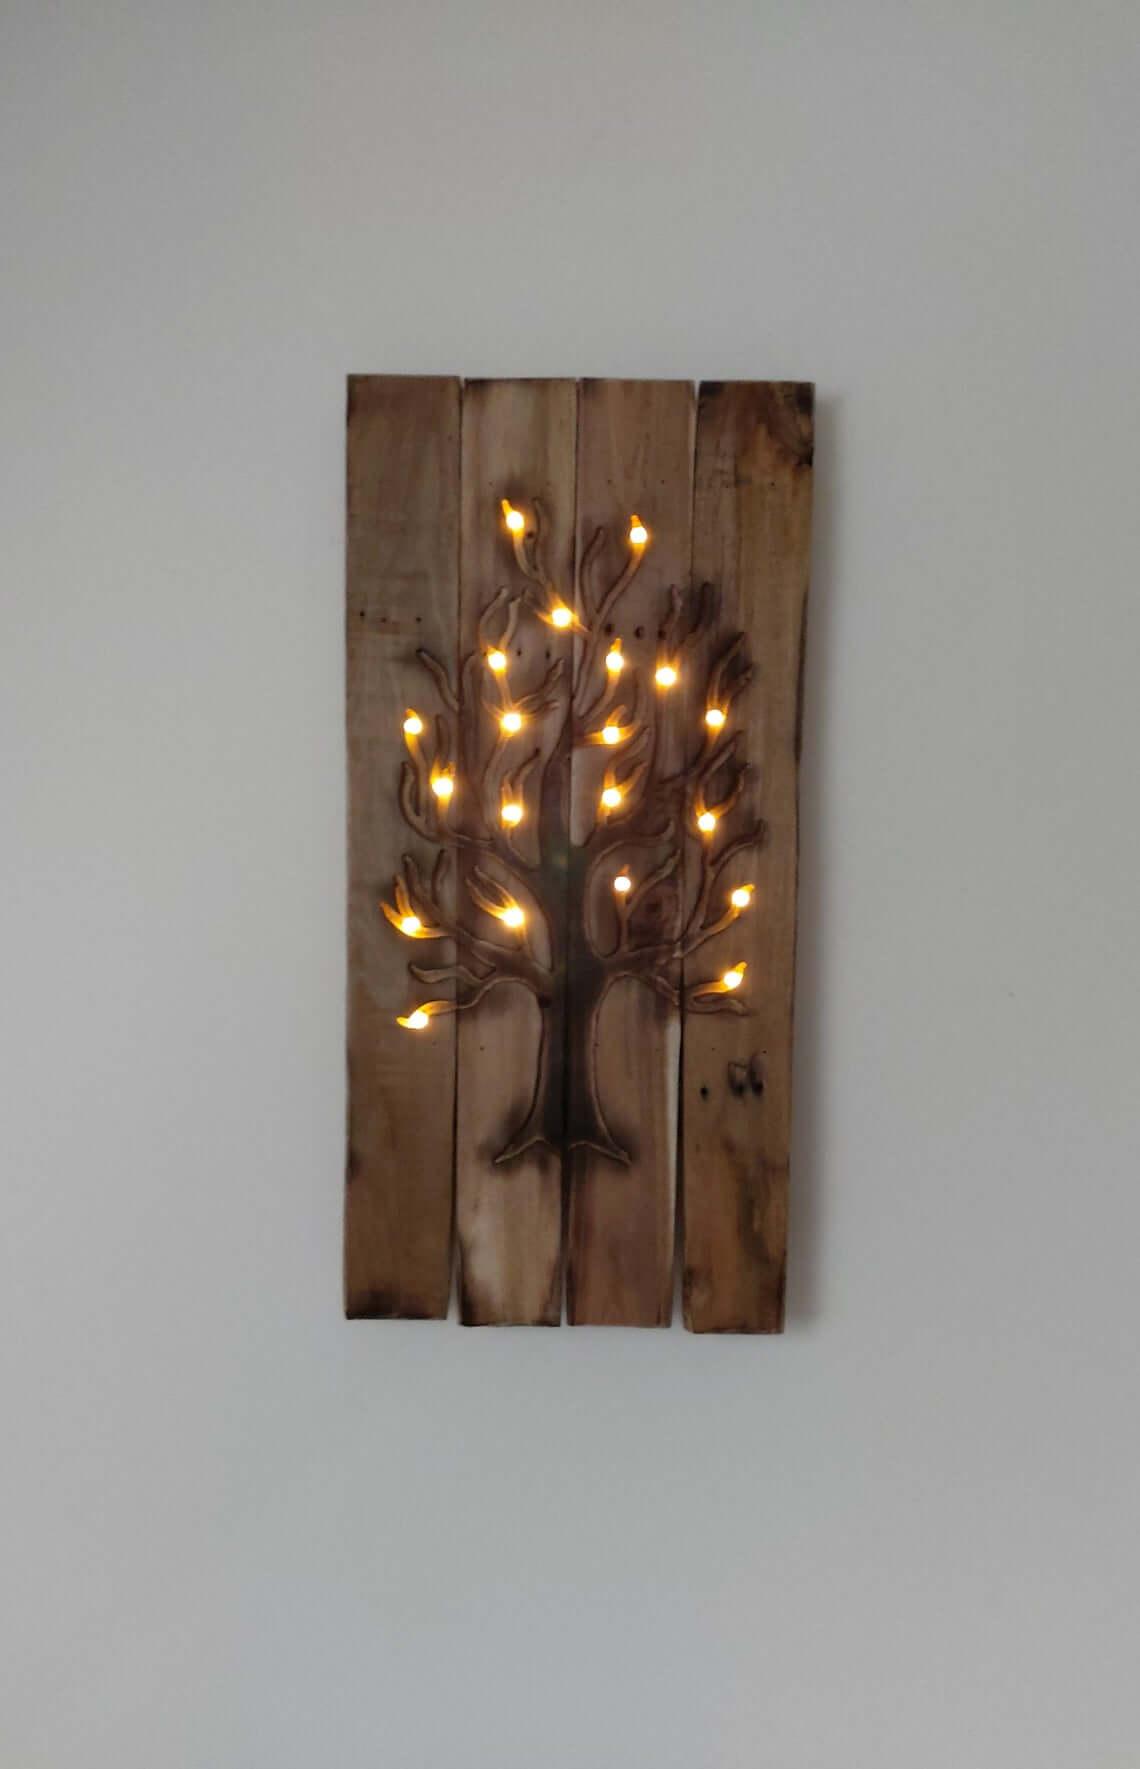 Unique Pre-Lit Tree Wooden Wall Art